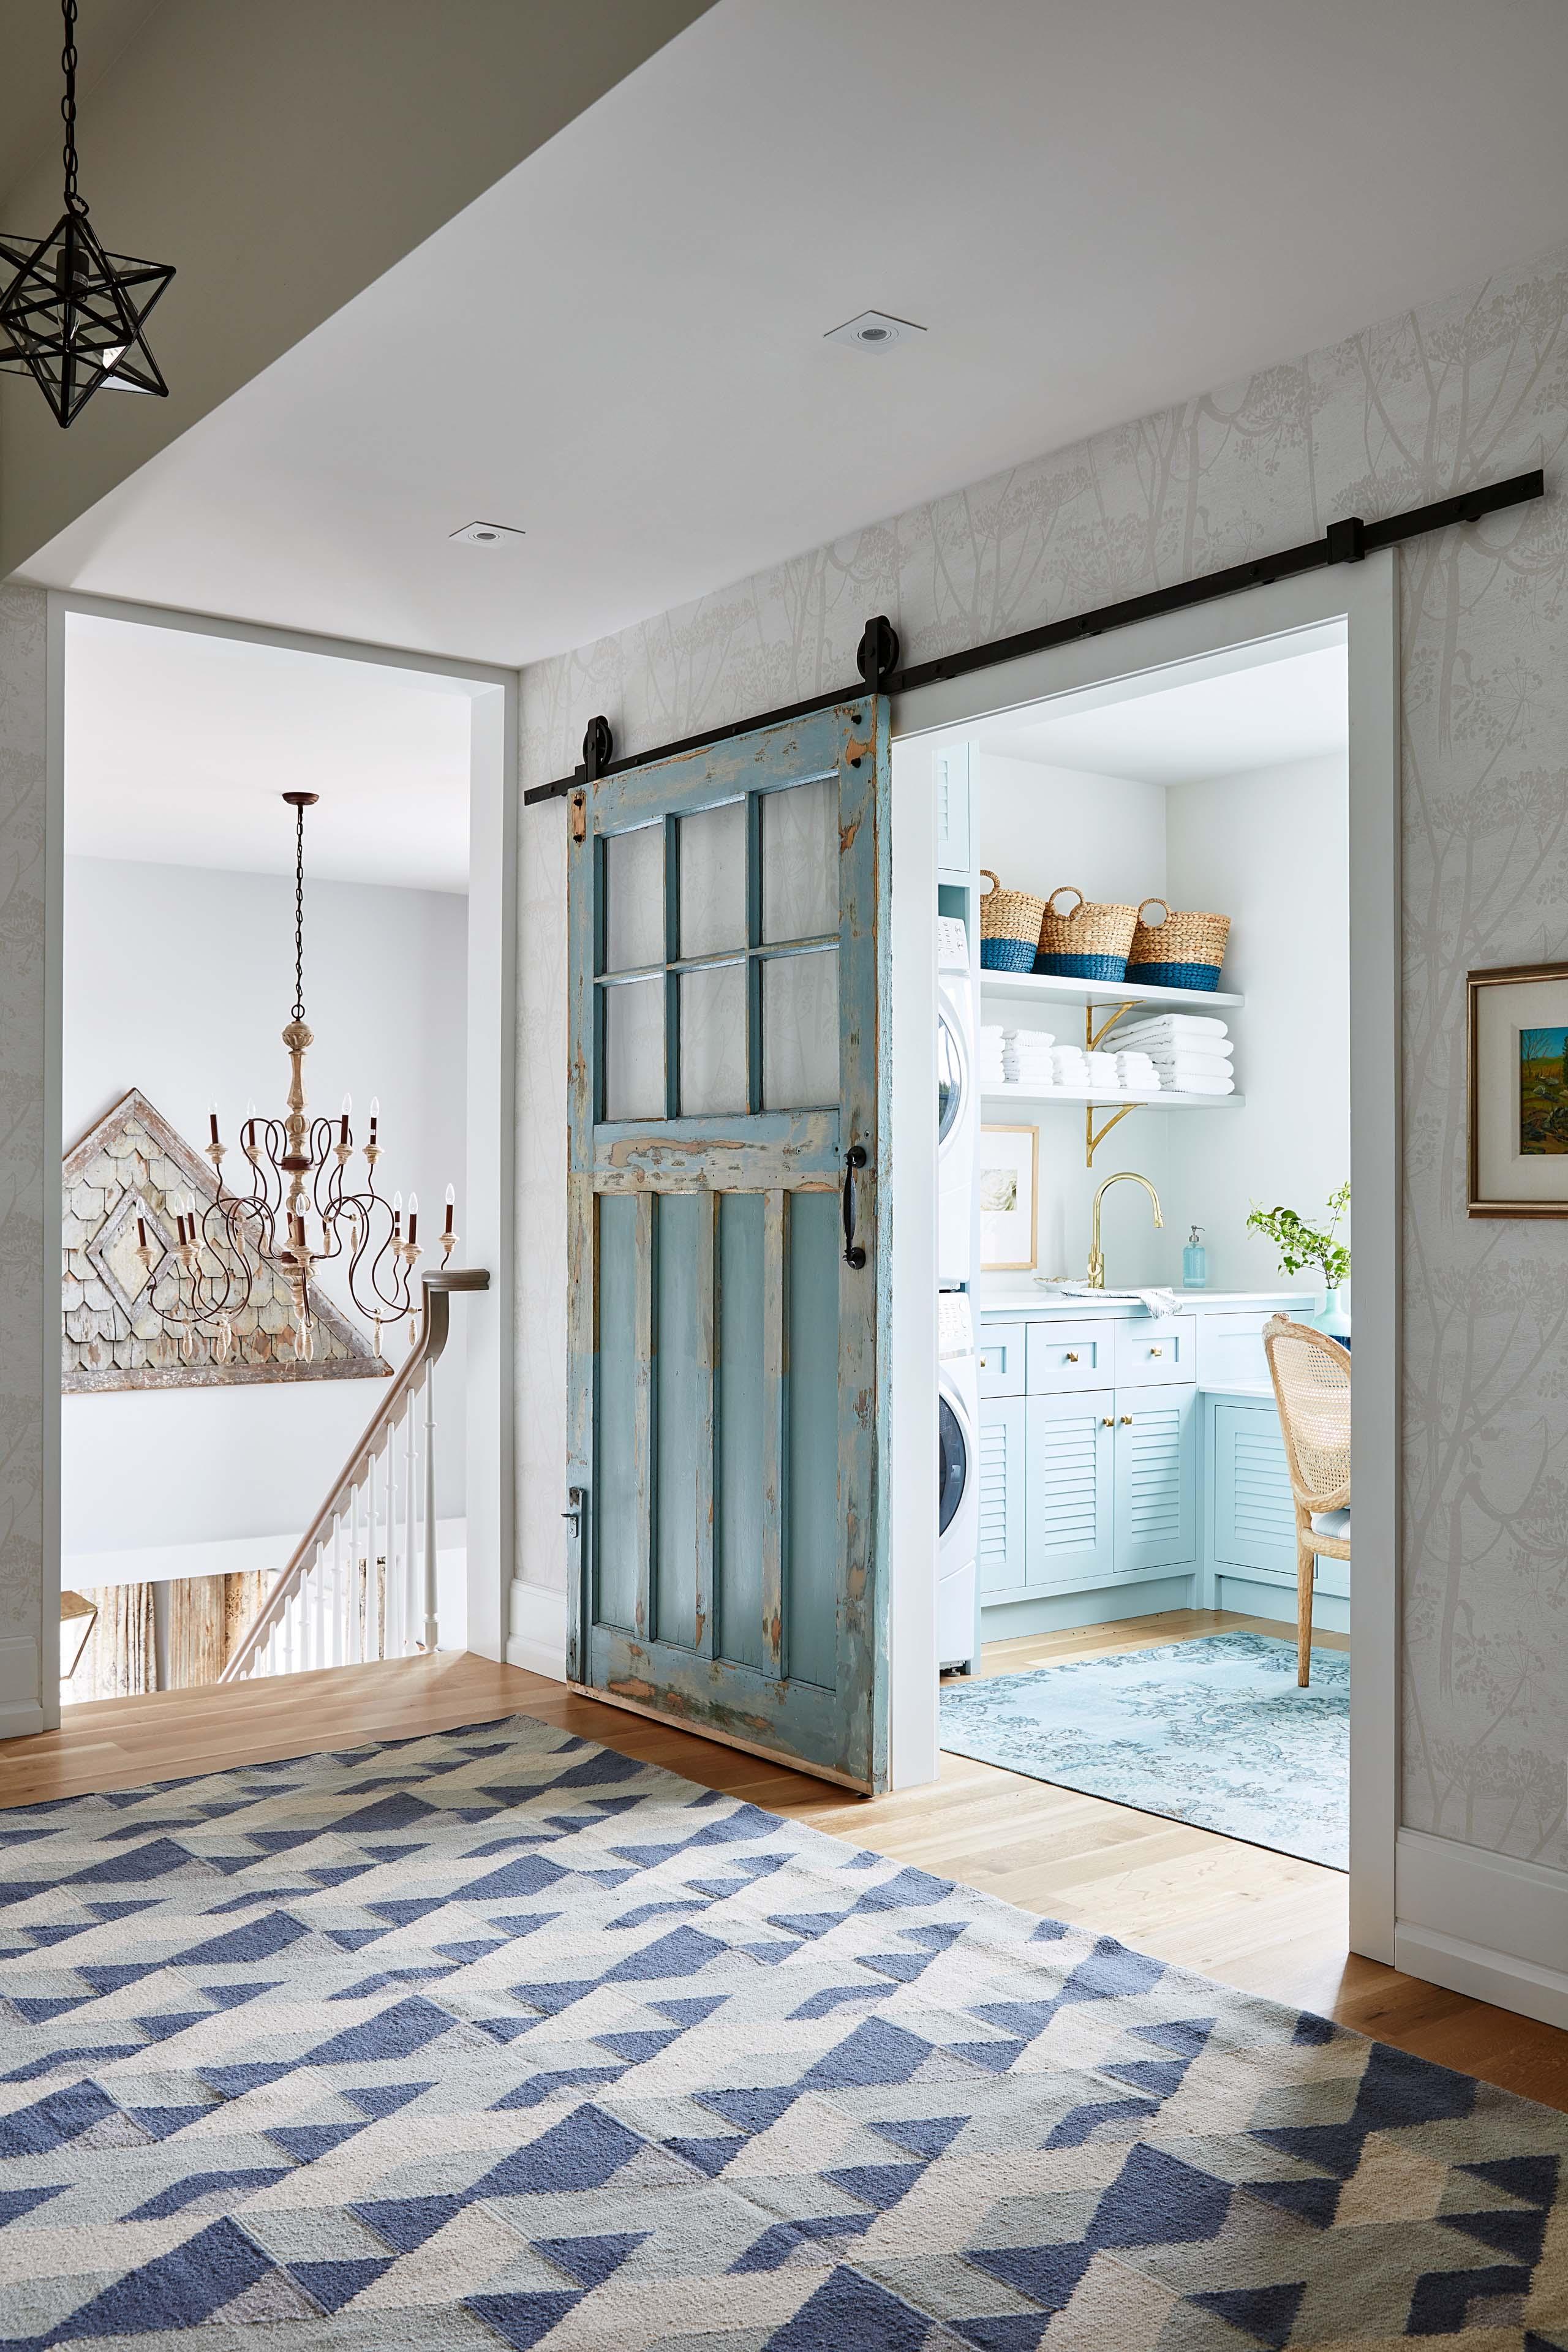 Sliding farmhouse door wih peely turquoise paint in classic home by #SarahRichardsn. #barndoor #turquoisedoor #farmhouselaundryroom